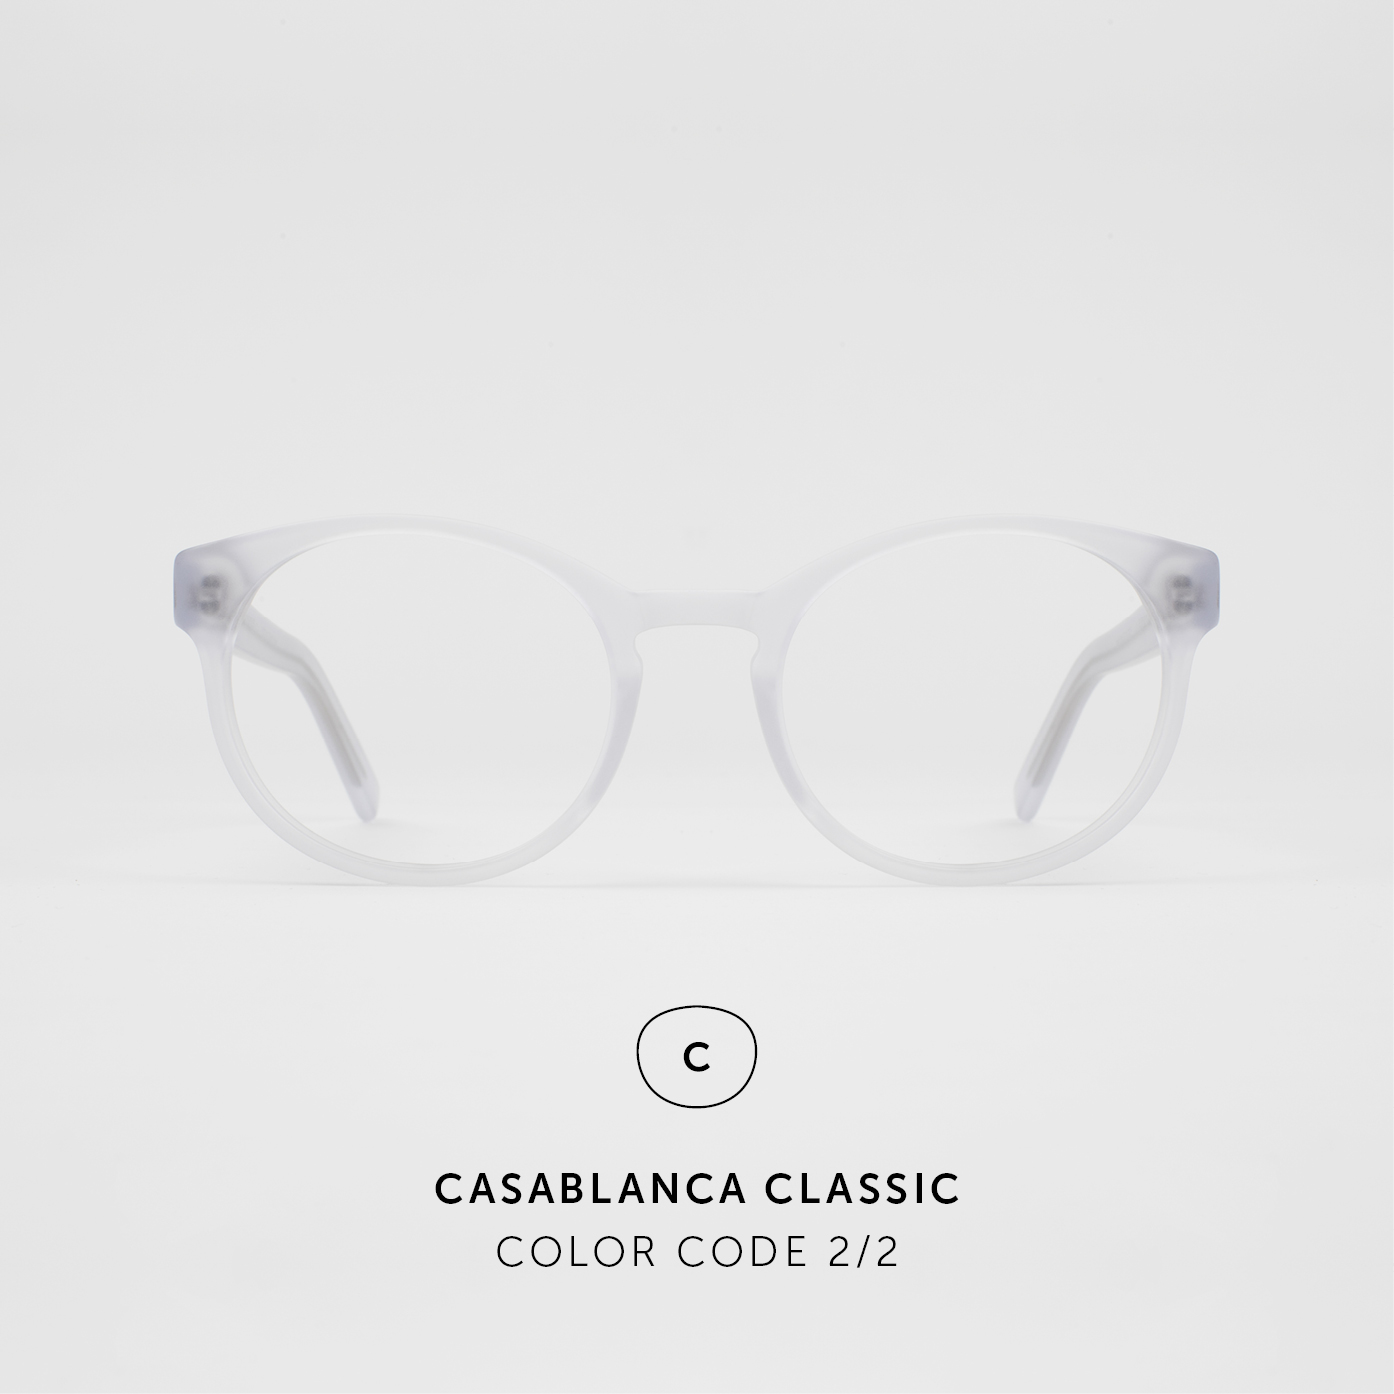 CasablancaClassic17.jpg